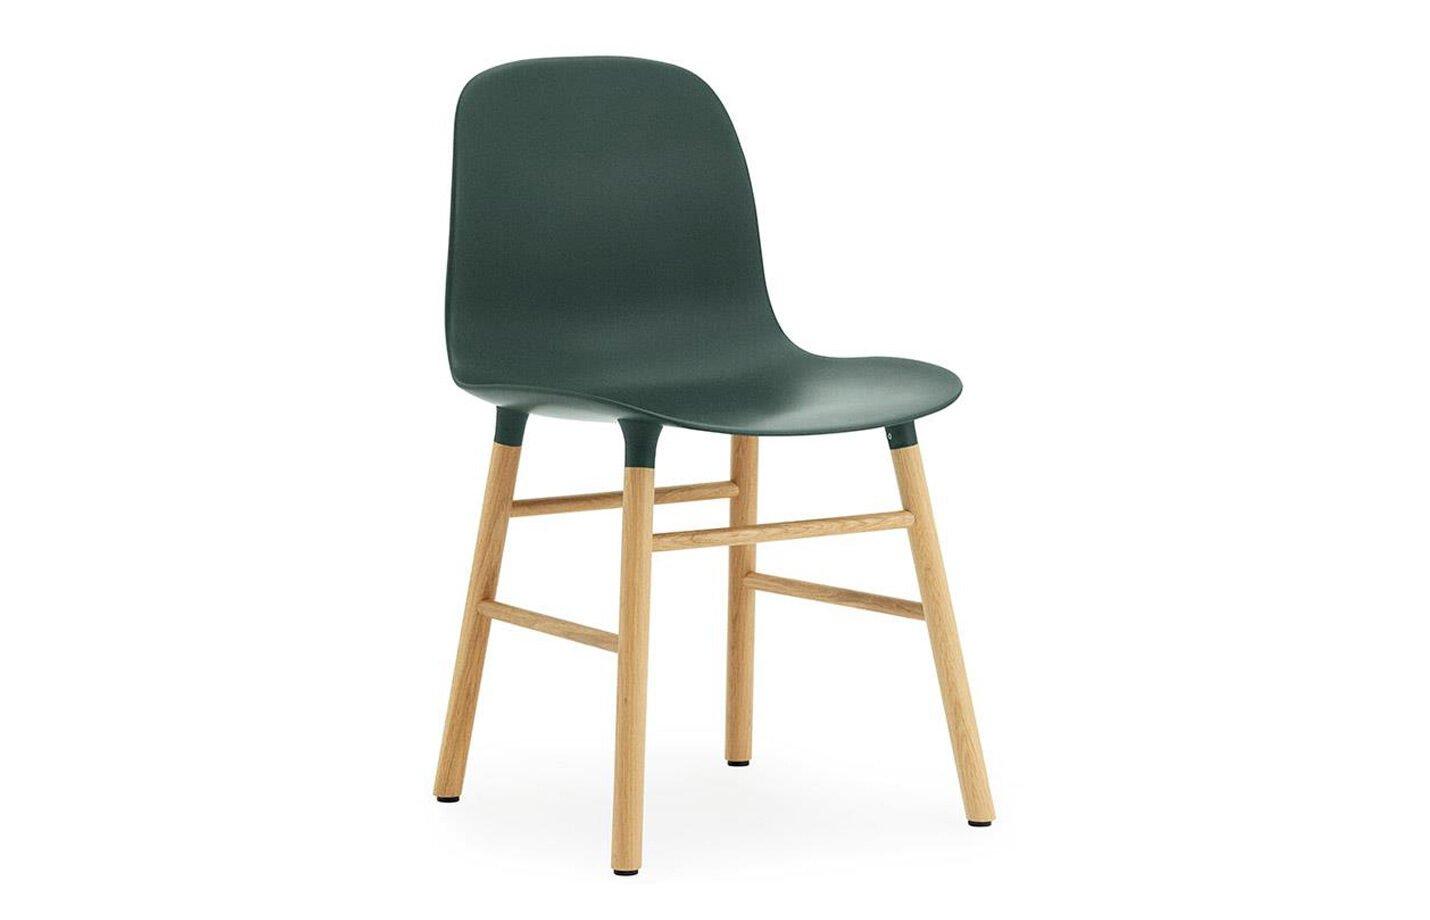 Form-chair-oak-Green-by-Normann